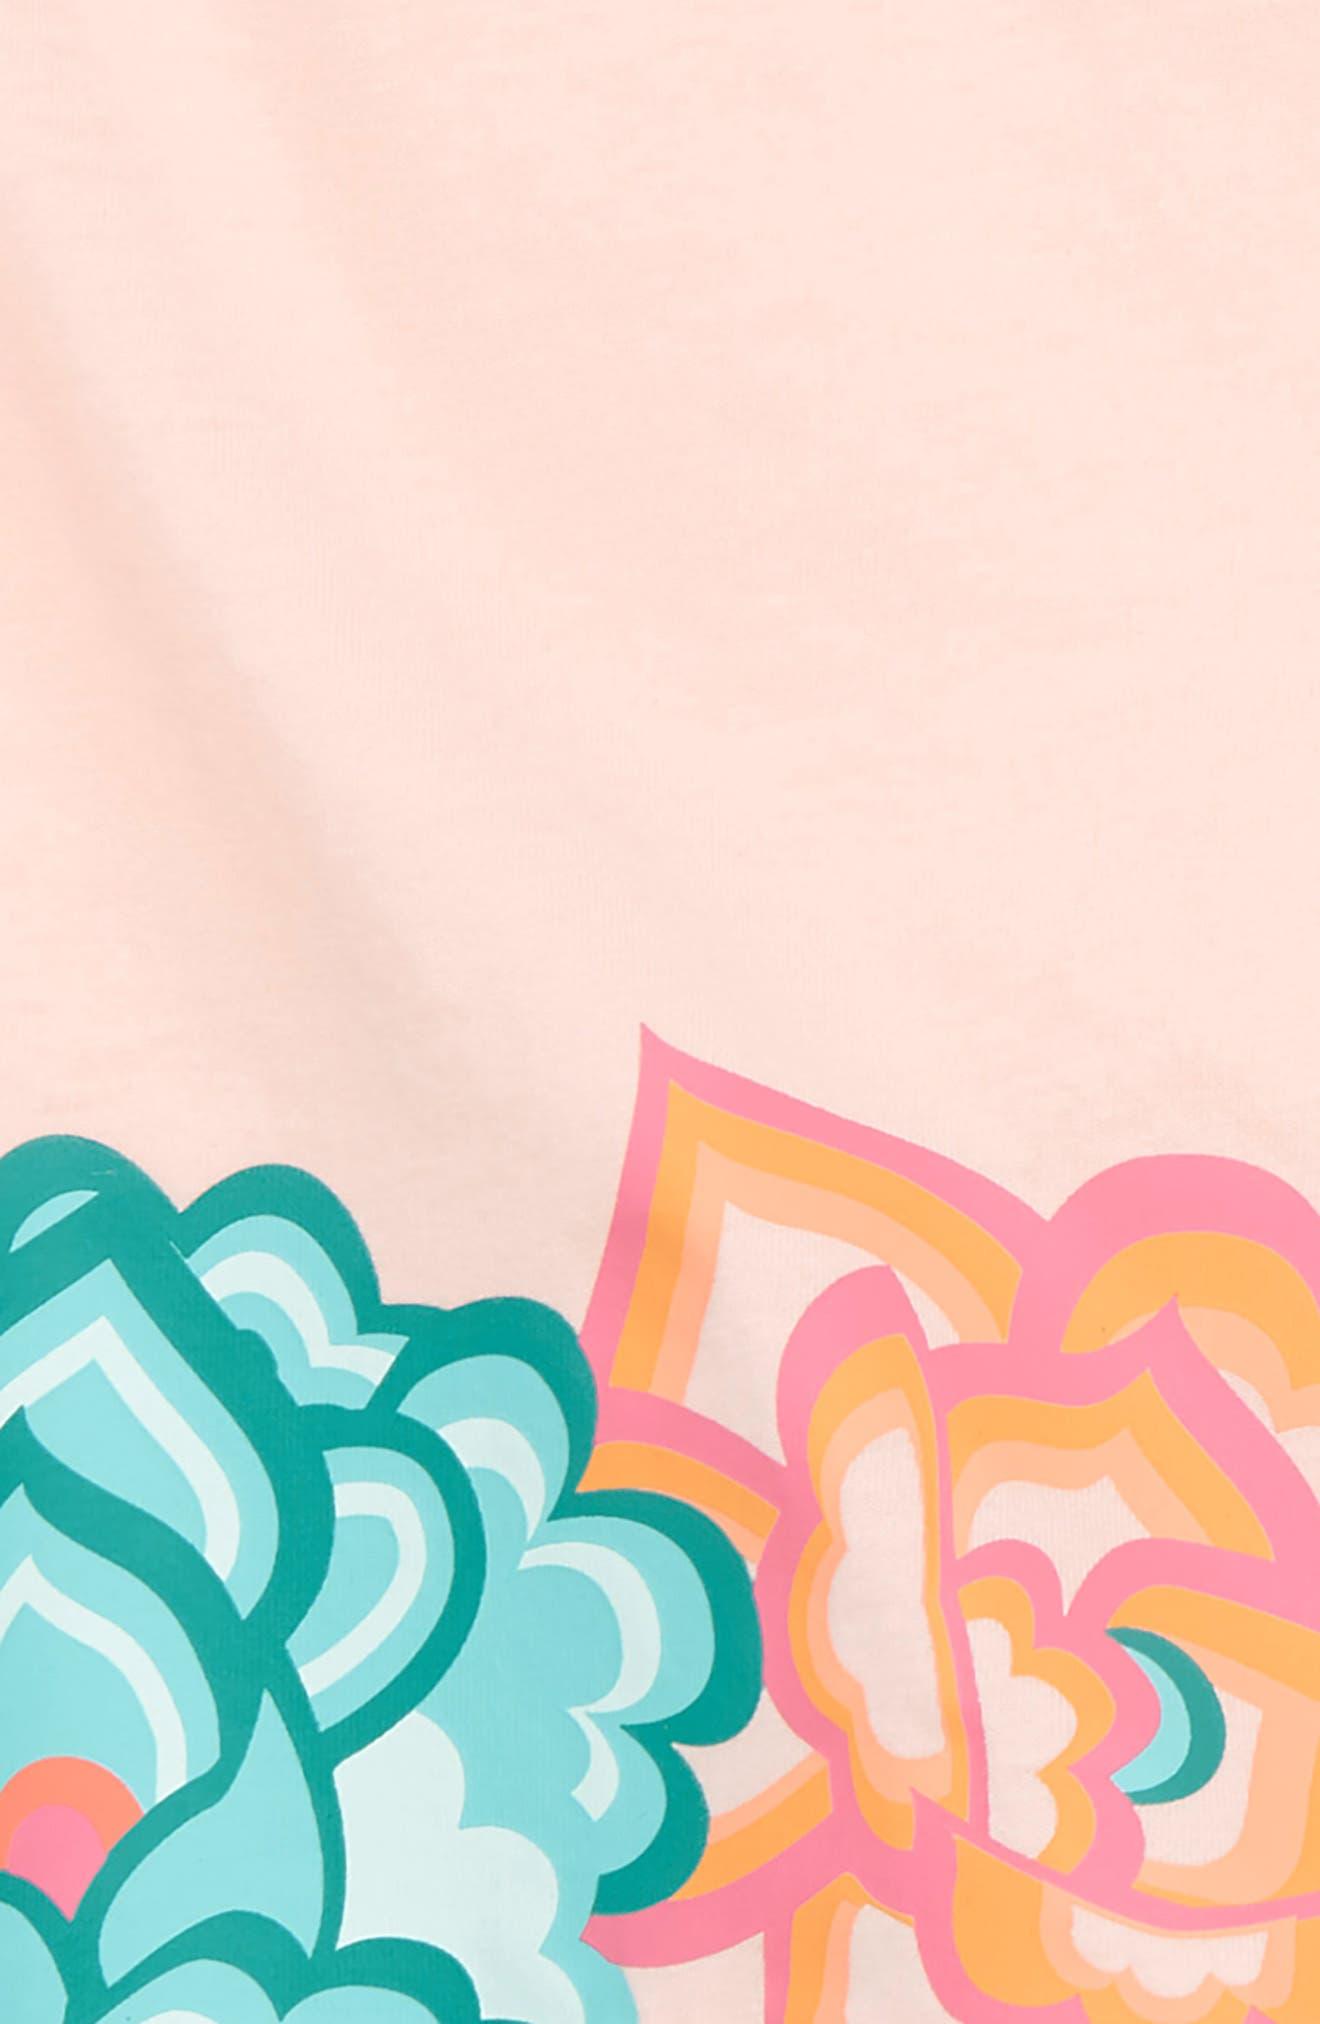 Floral Ruffle Top & Shorts Set,                             Alternate thumbnail 2, color,                             691